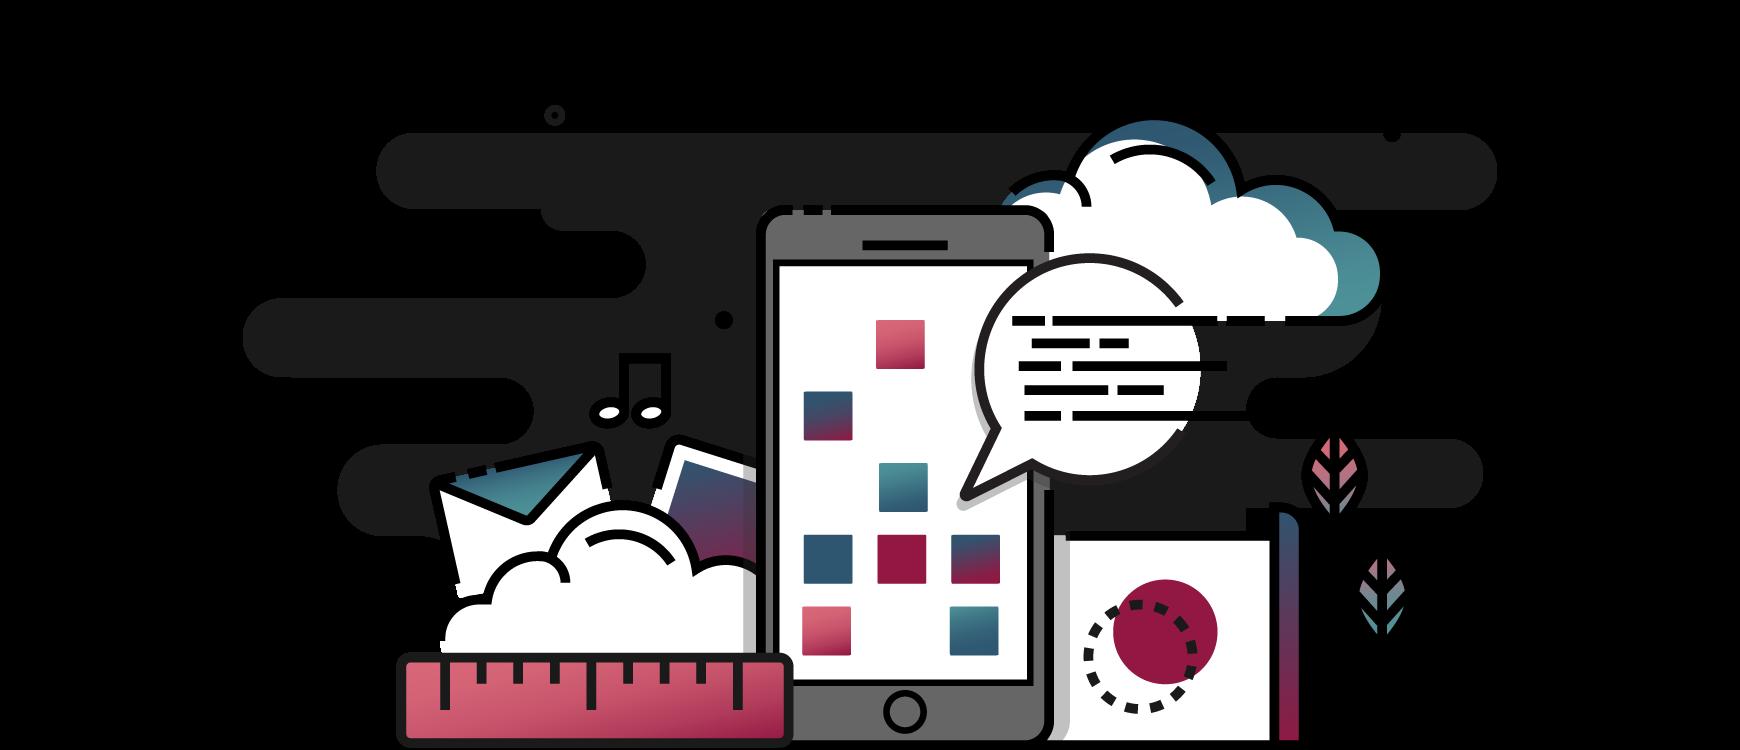 SugarLab Creative | Custom Website & App Development